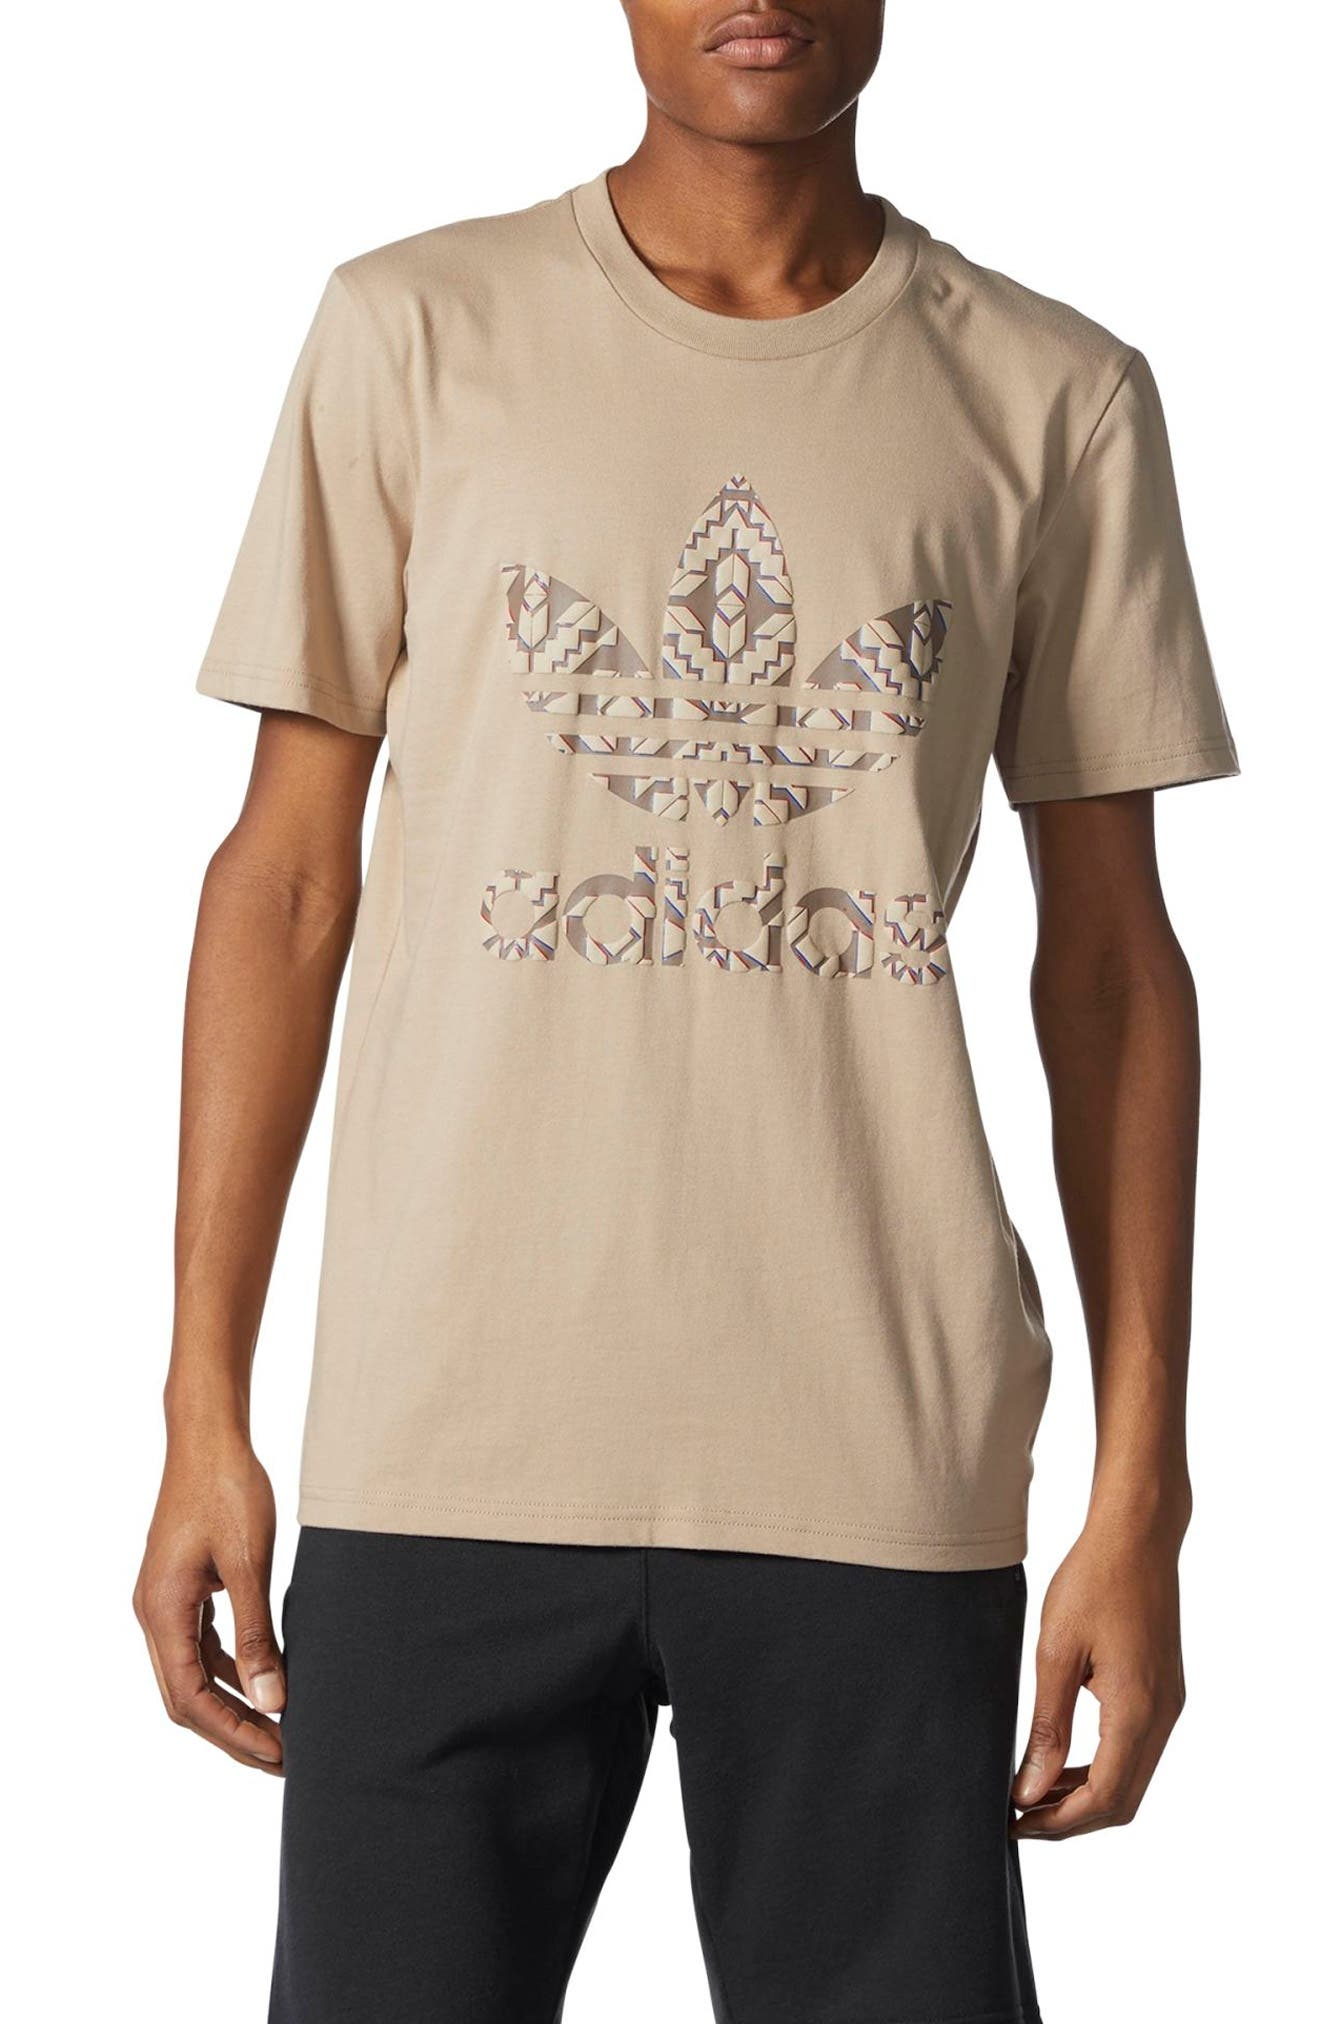 adidas Originals Chicago Stacked 3D Logo T-Shirt